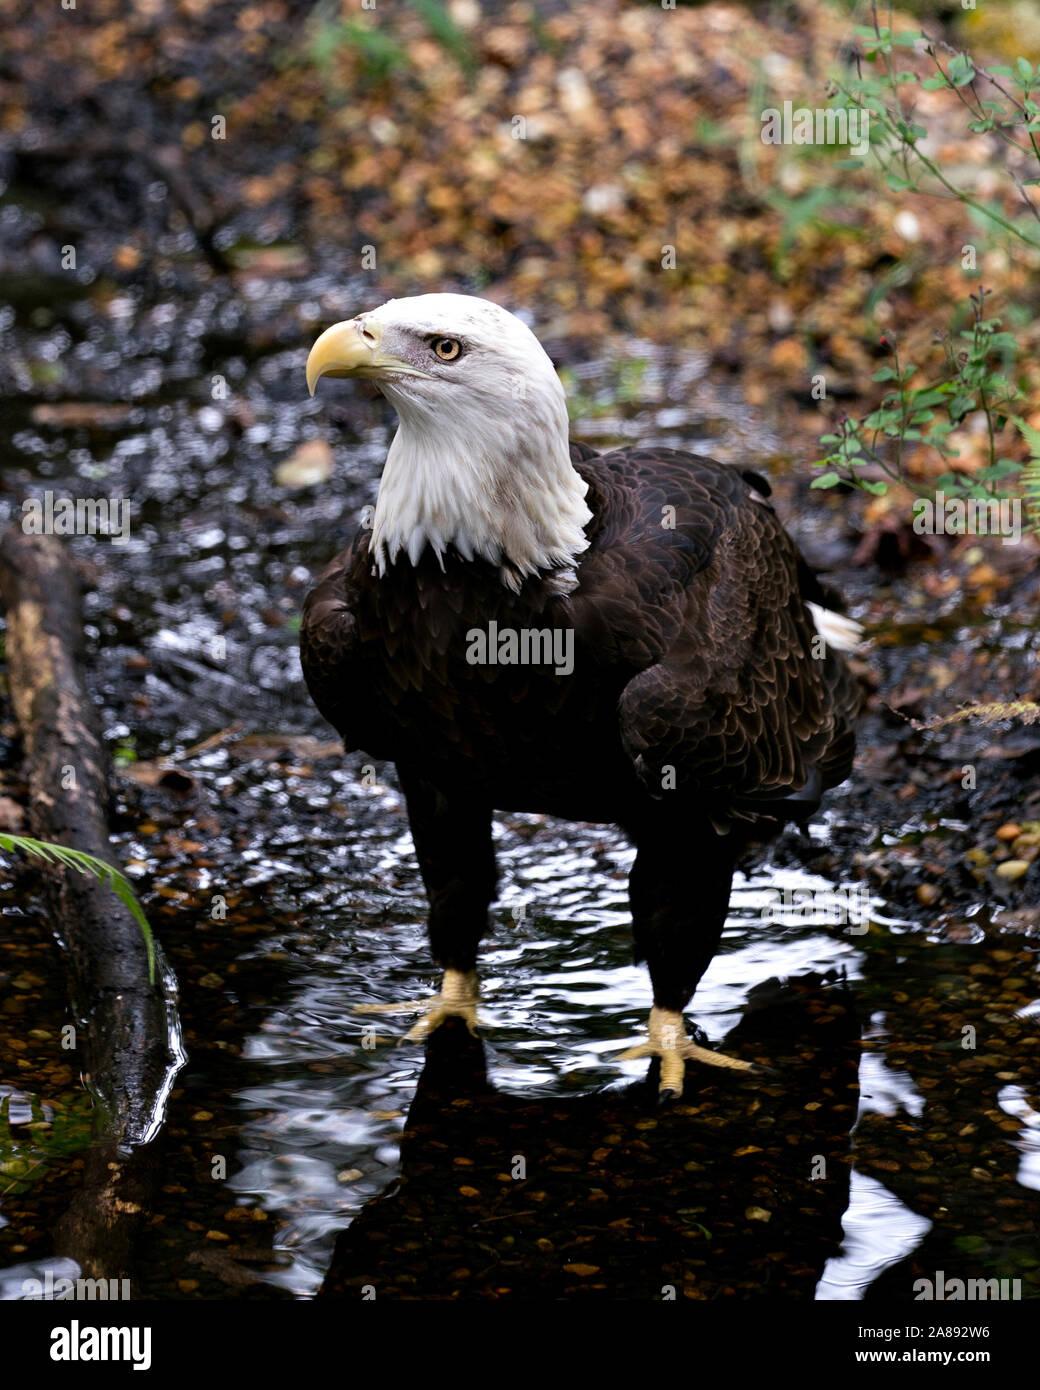 Eagle Talon Bird : eagle, talon, Eagle, Water, Displaying, Body,, Head,, Eye,beak,, Talons, Foliage, Background, Surrounding, Environment, Stock, Photo, Alamy